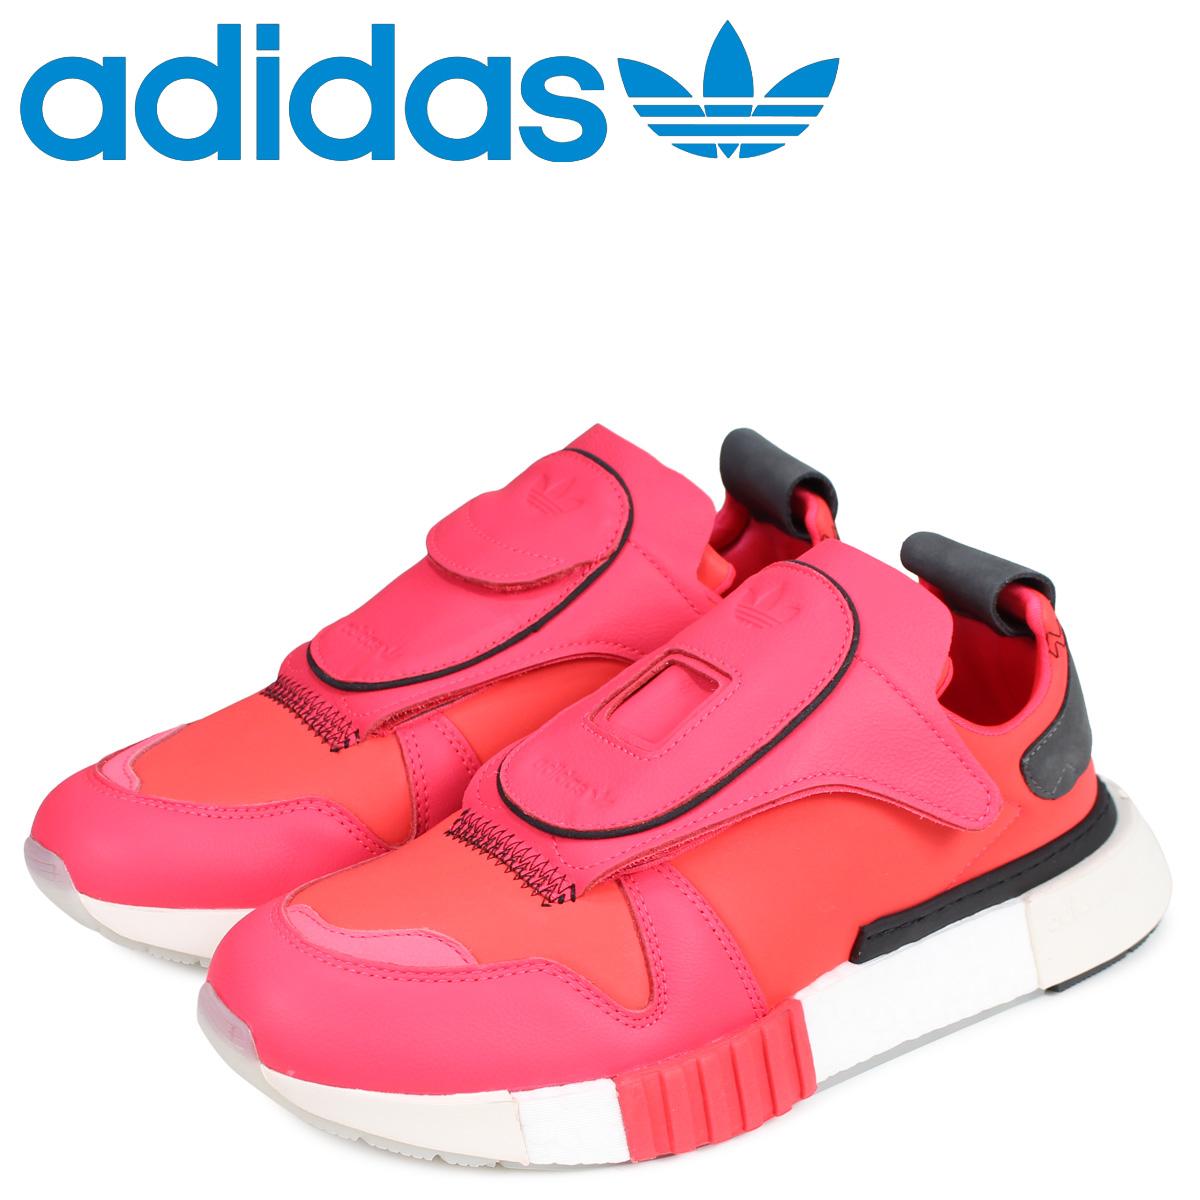 adidas Originals アディダス オリジナルス フューチャーペーサー スニーカー メンズ FUTUREPACER レッド BD7923